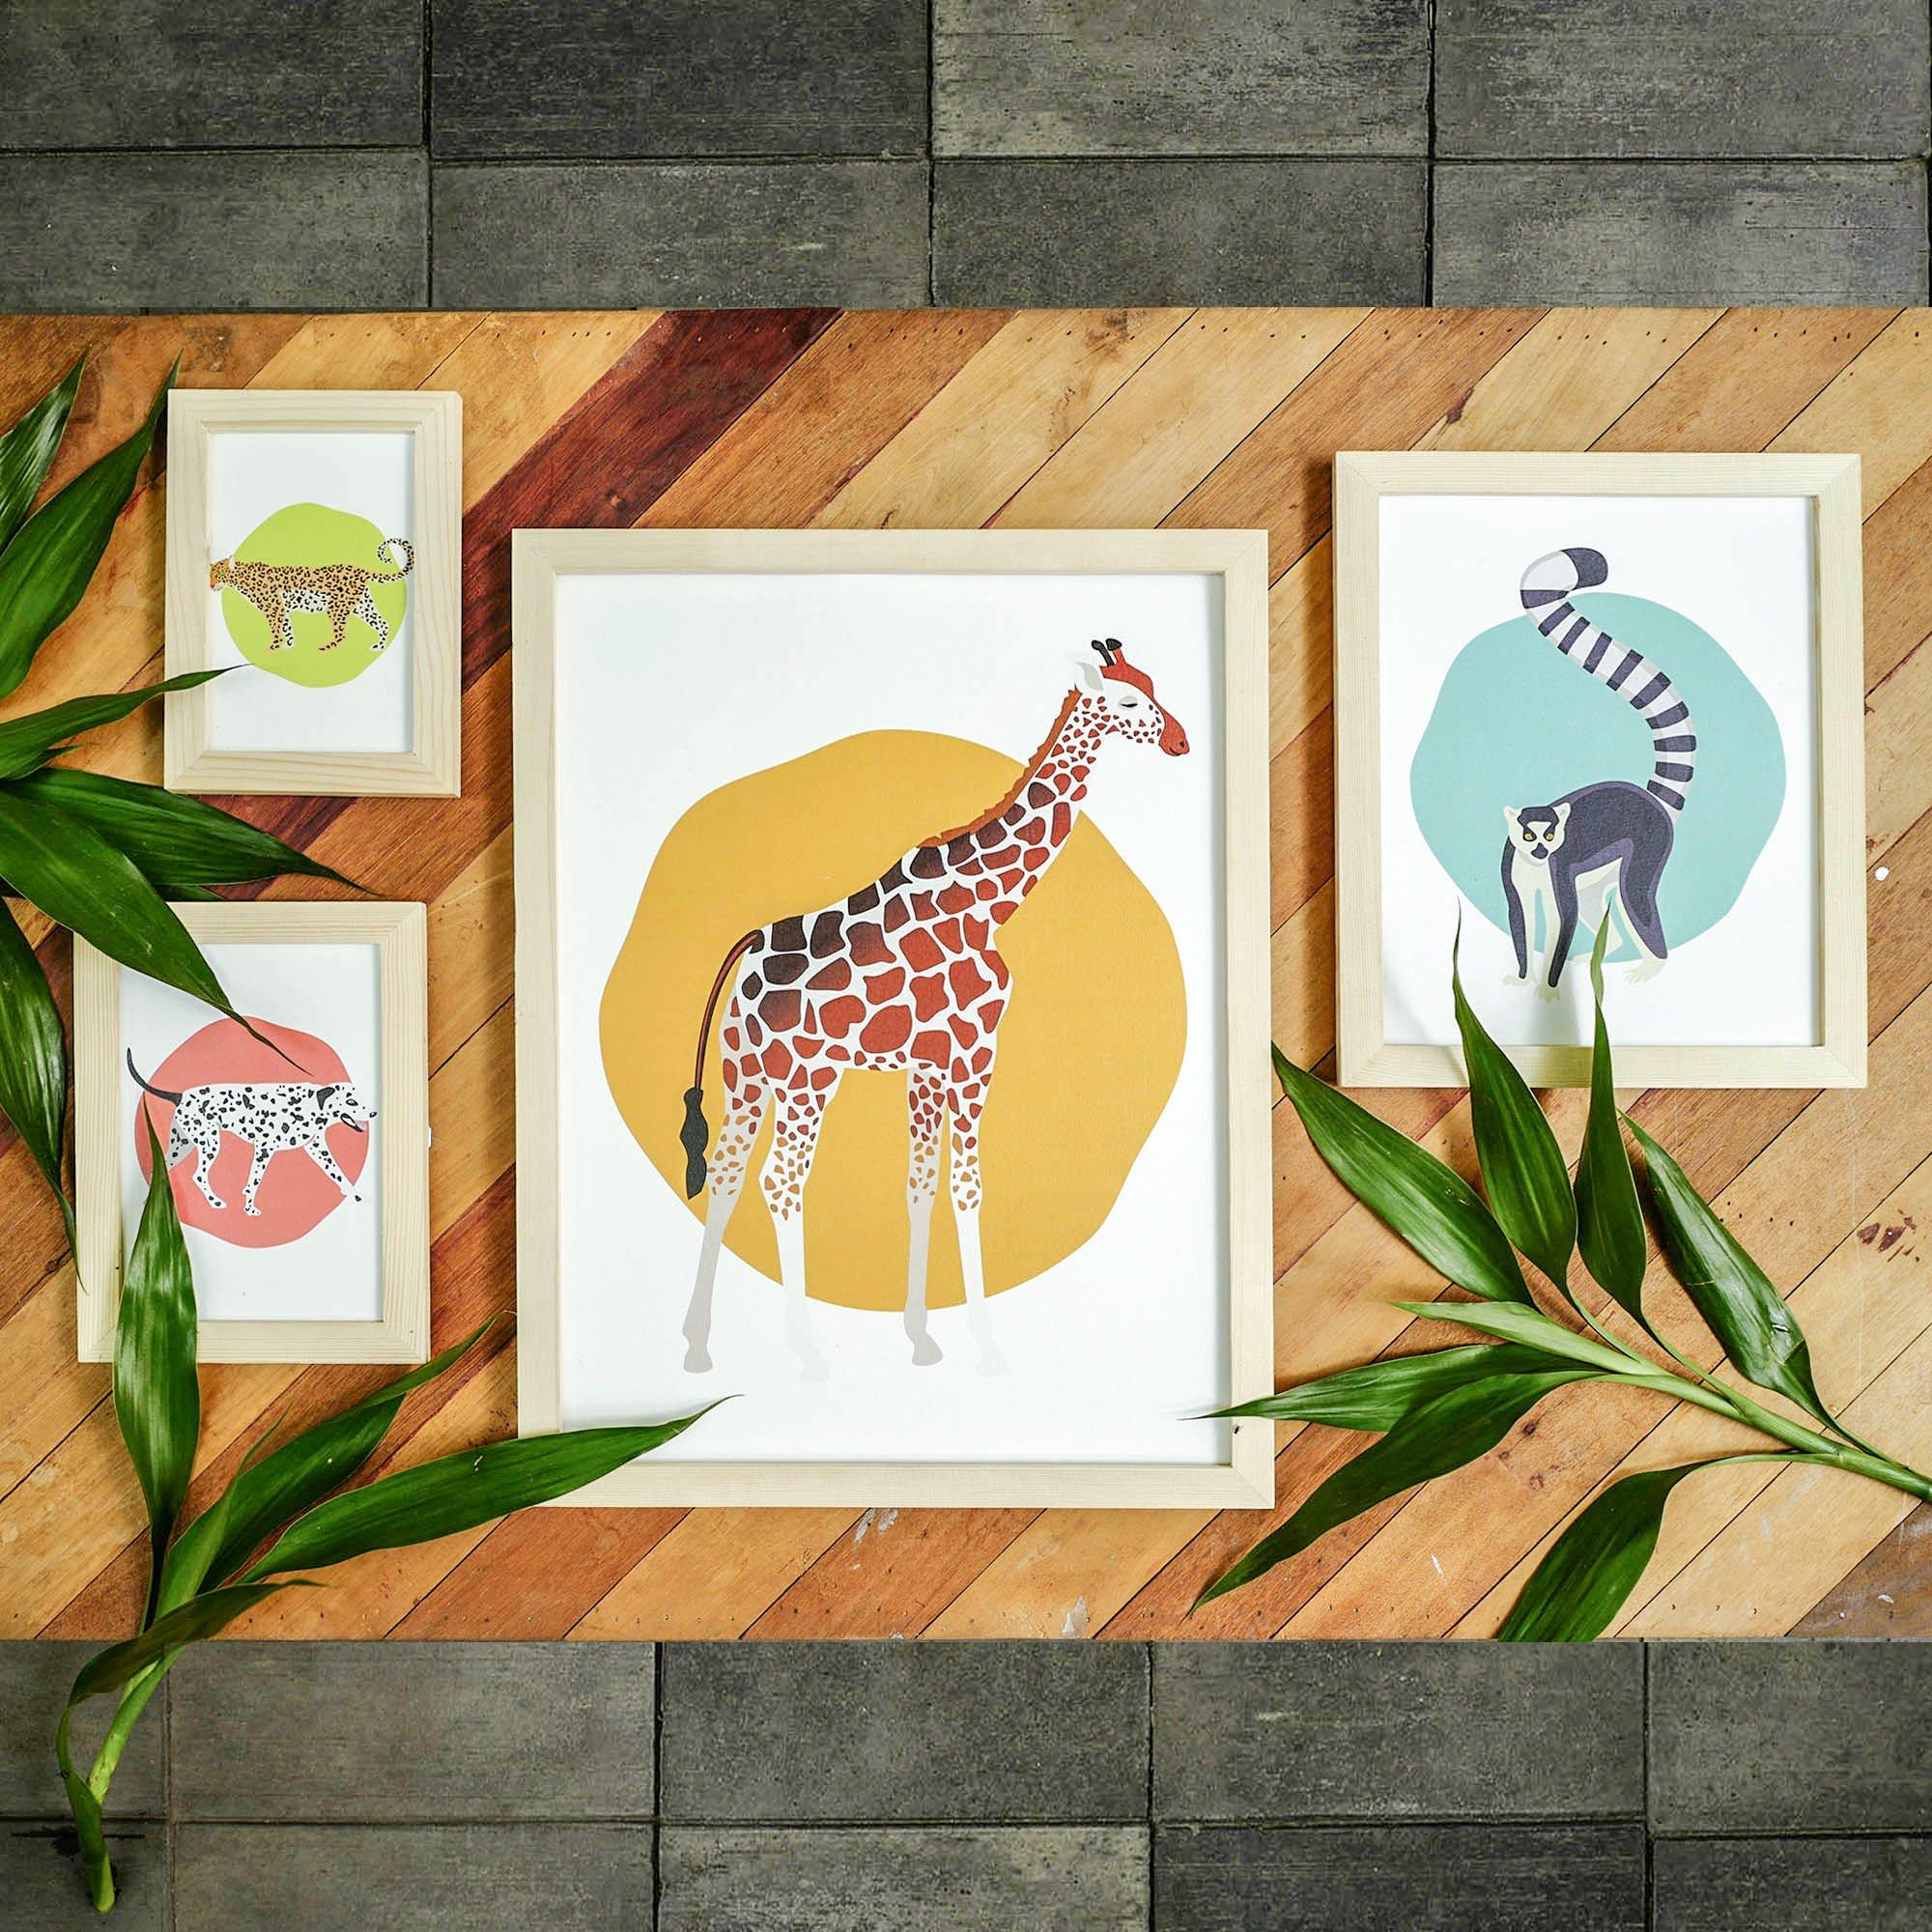 Natural Colour Wooden Frame with Photos - Ceramic(copy)